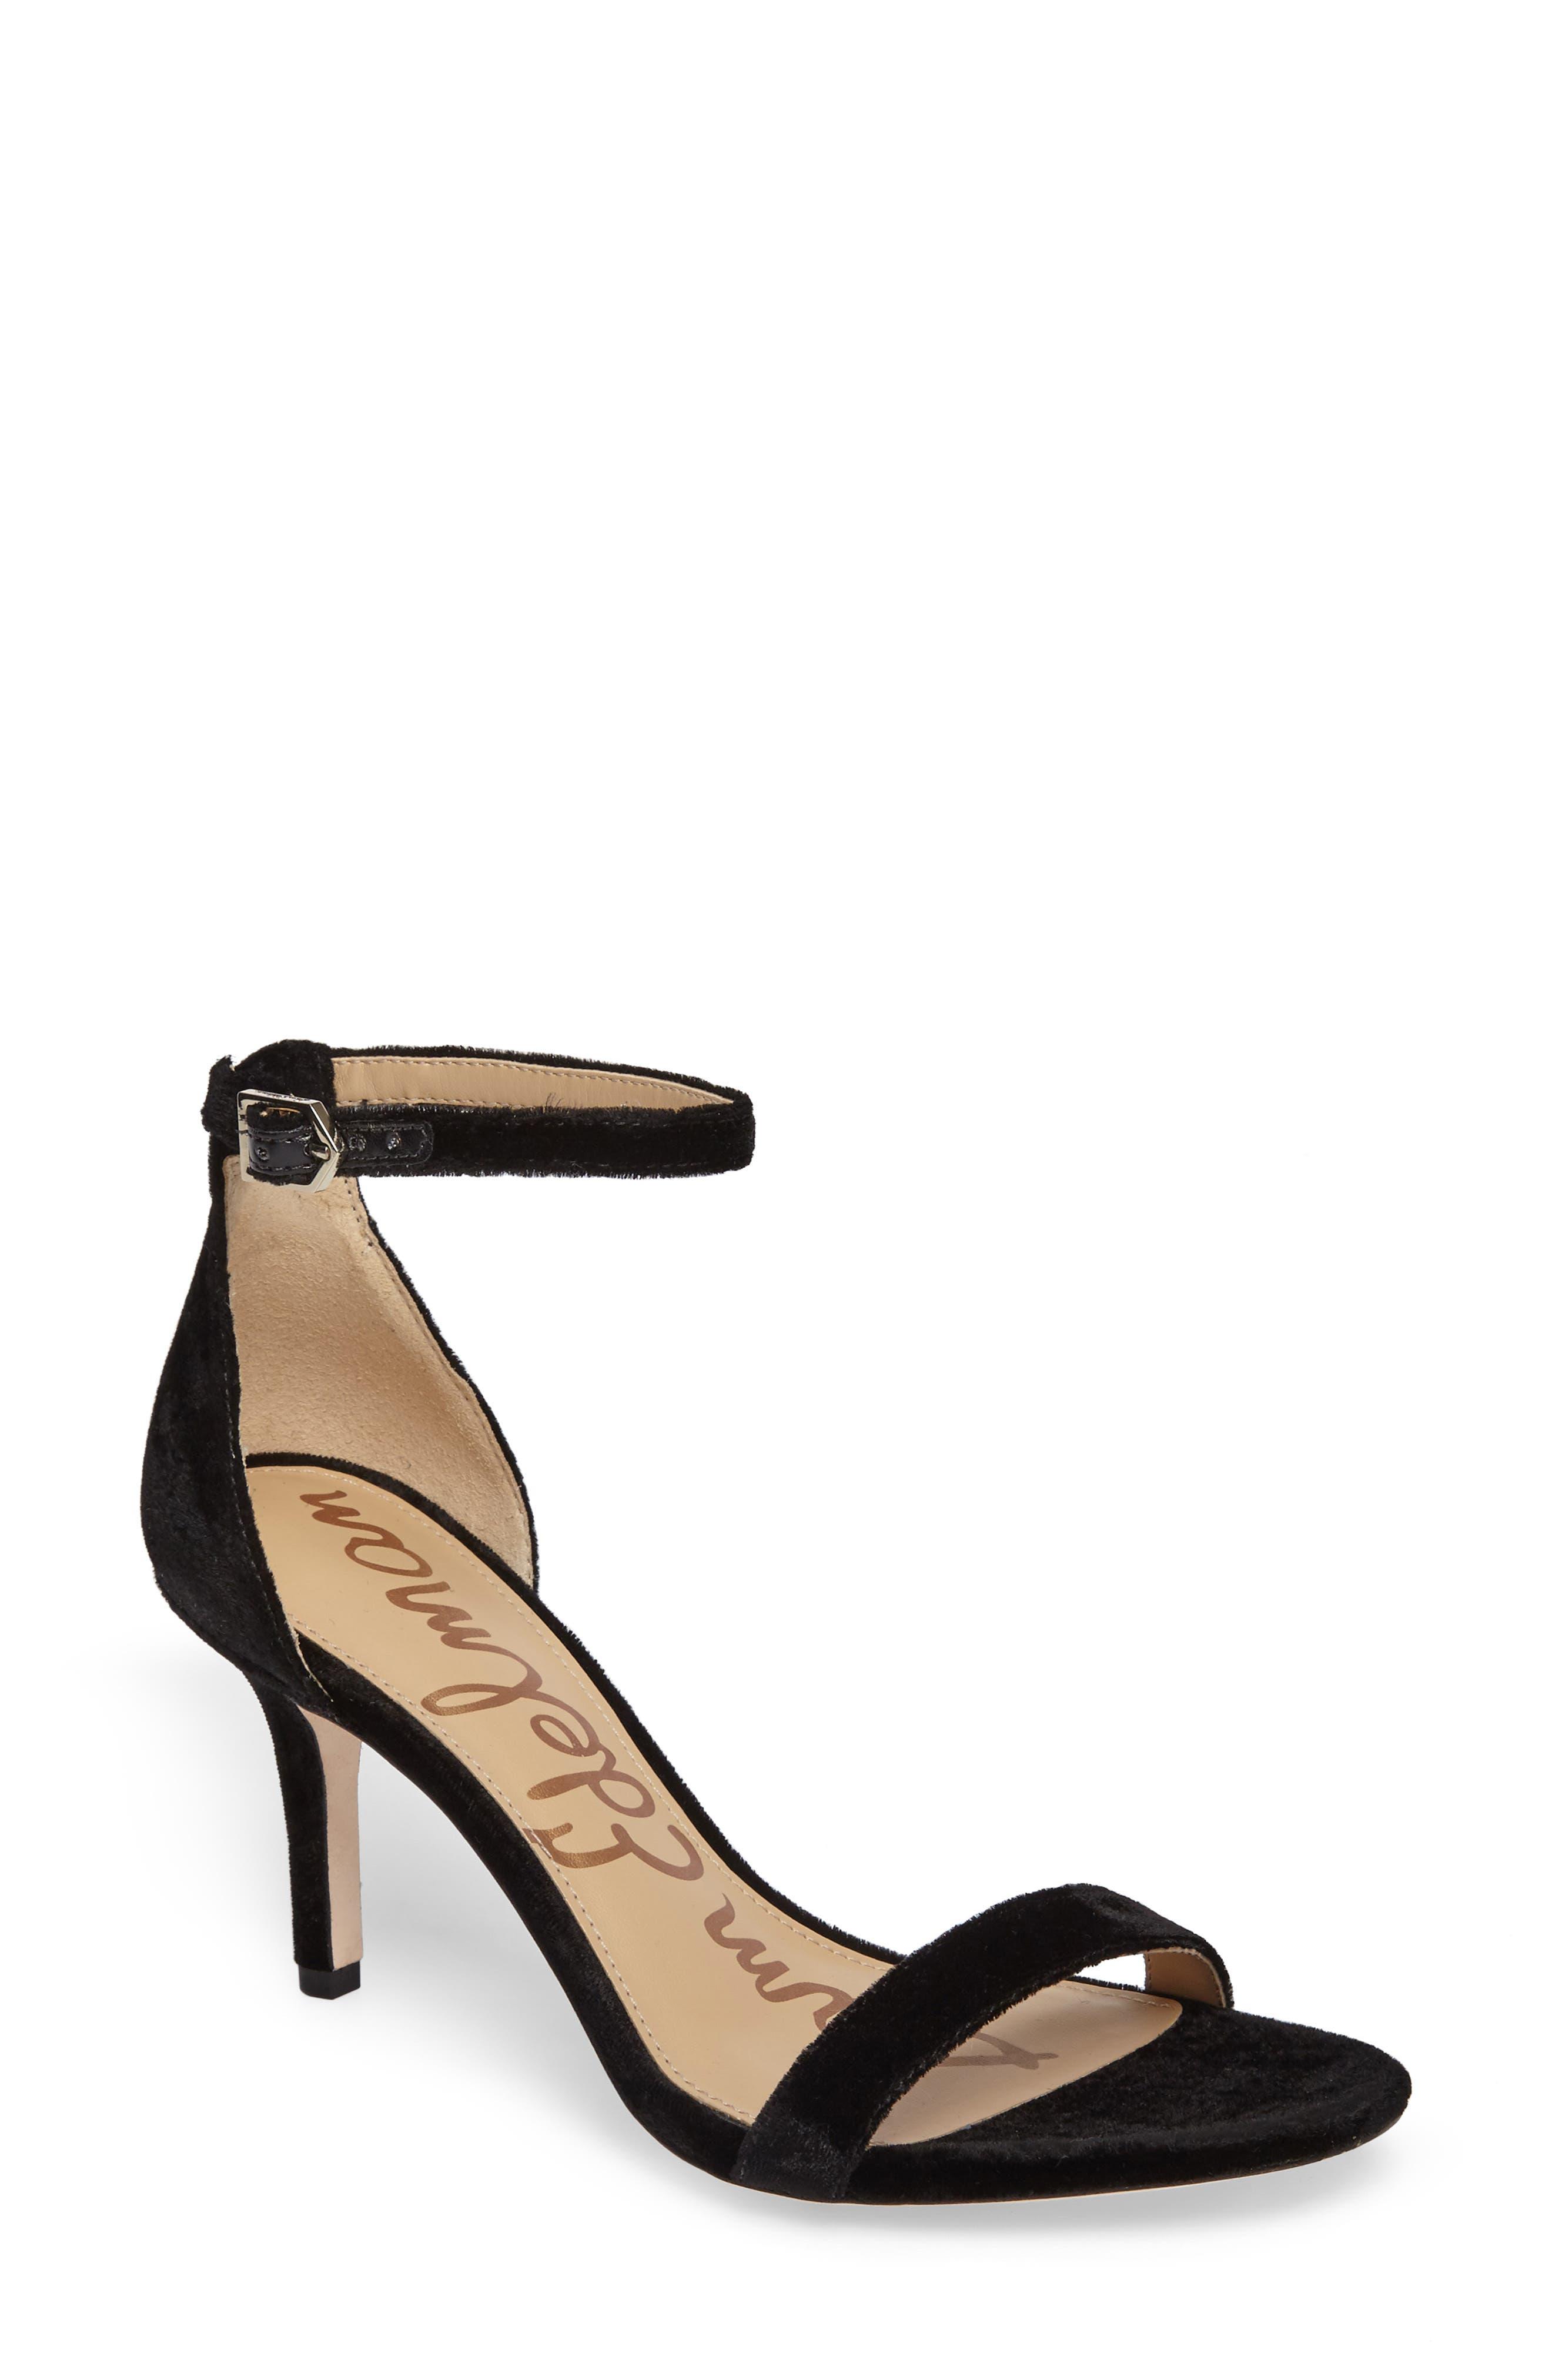 SAM EDELMAN, 'Patti' Ankle Strap Sandal, Main thumbnail 1, color, BLACK VELVET